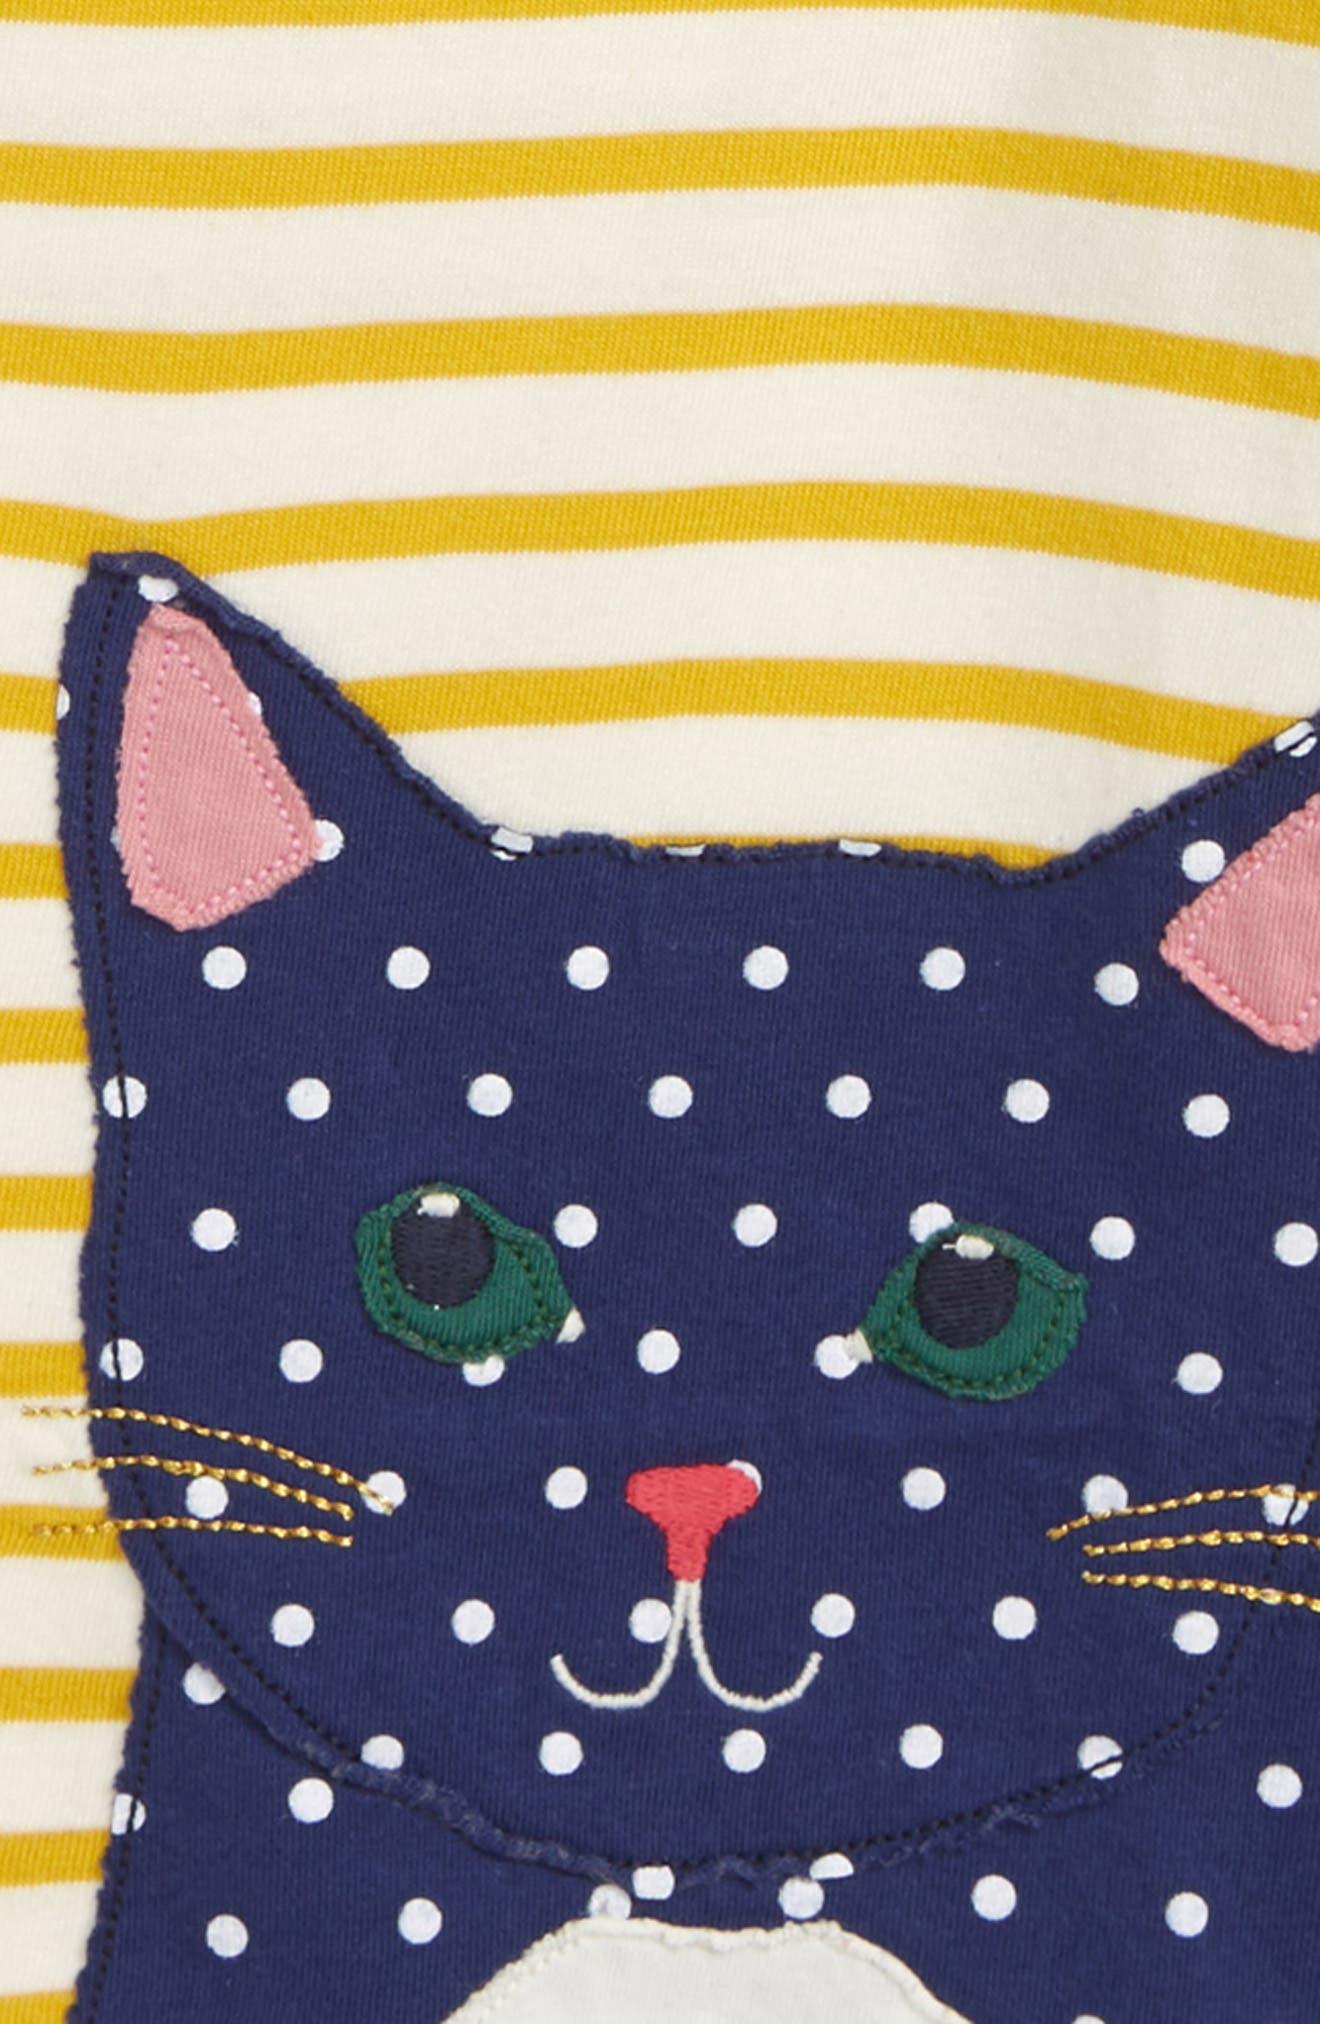 Appliqué Breton Shirt,                             Alternate thumbnail 2, color,                             HONEYCOMB/ ECRU CAT